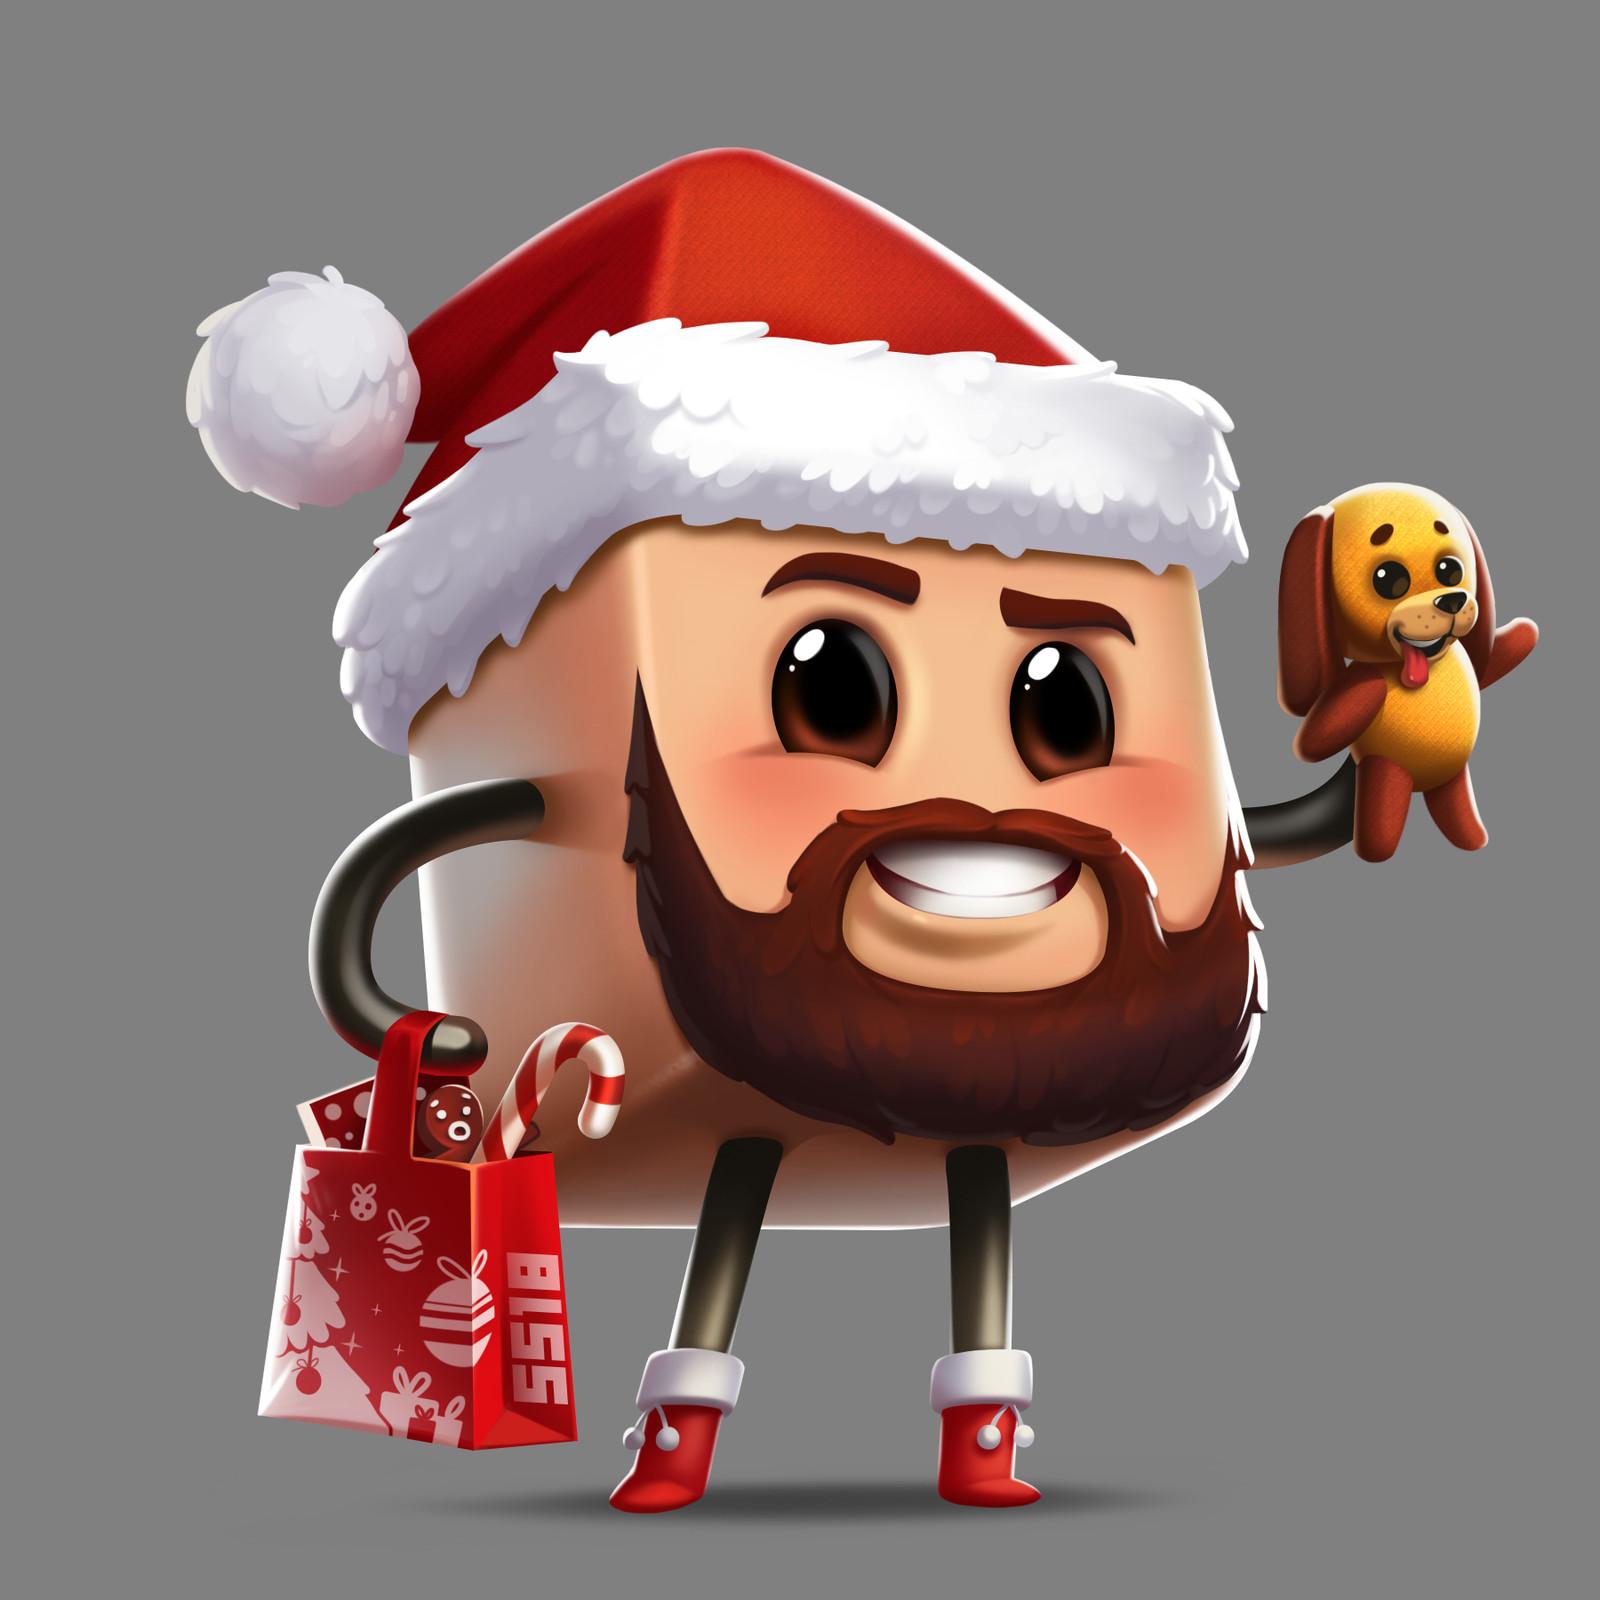 Happy Holidays from 5518 Studios